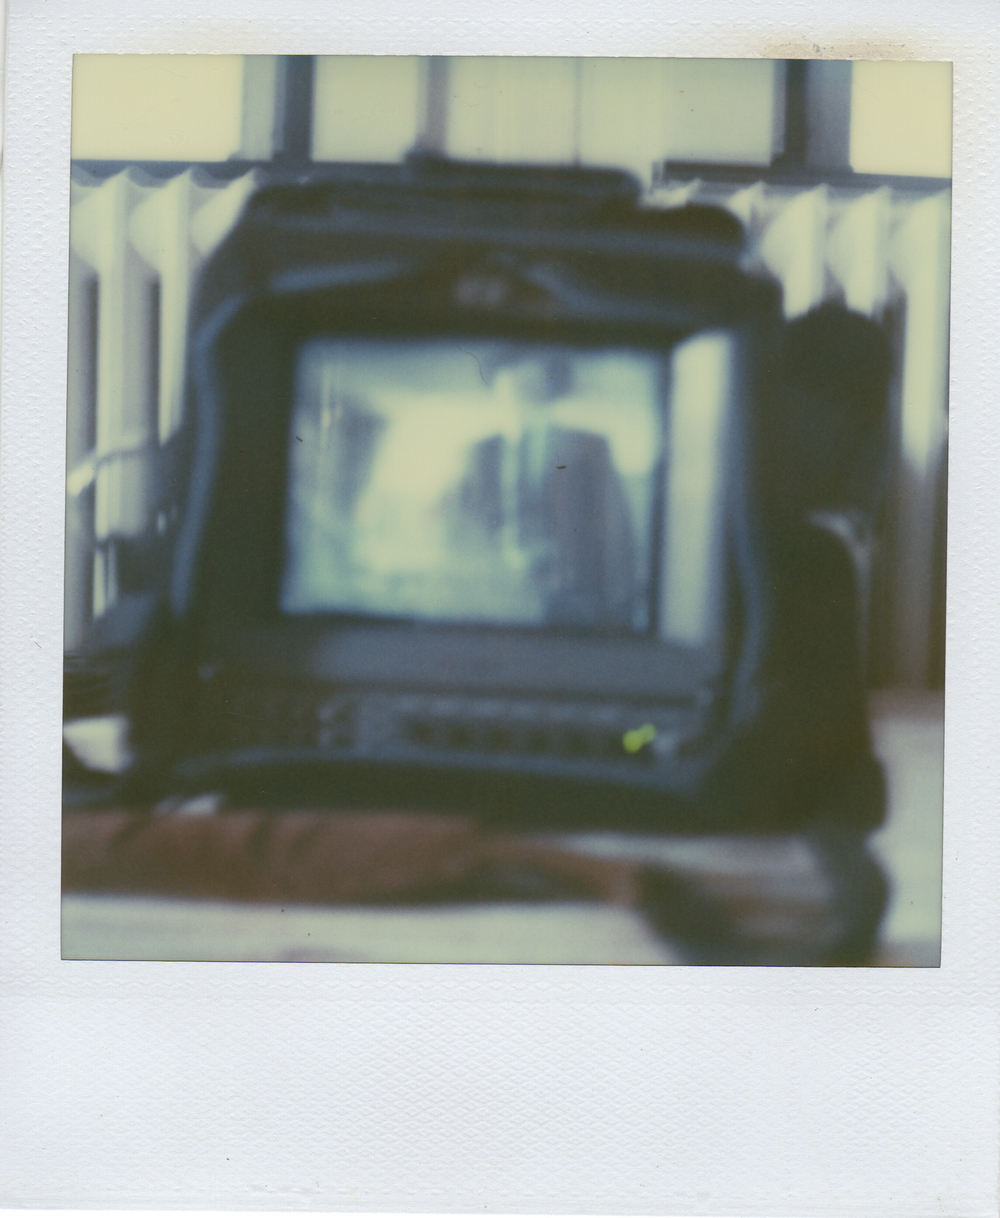 jlaurence-polaroid-077.jpg